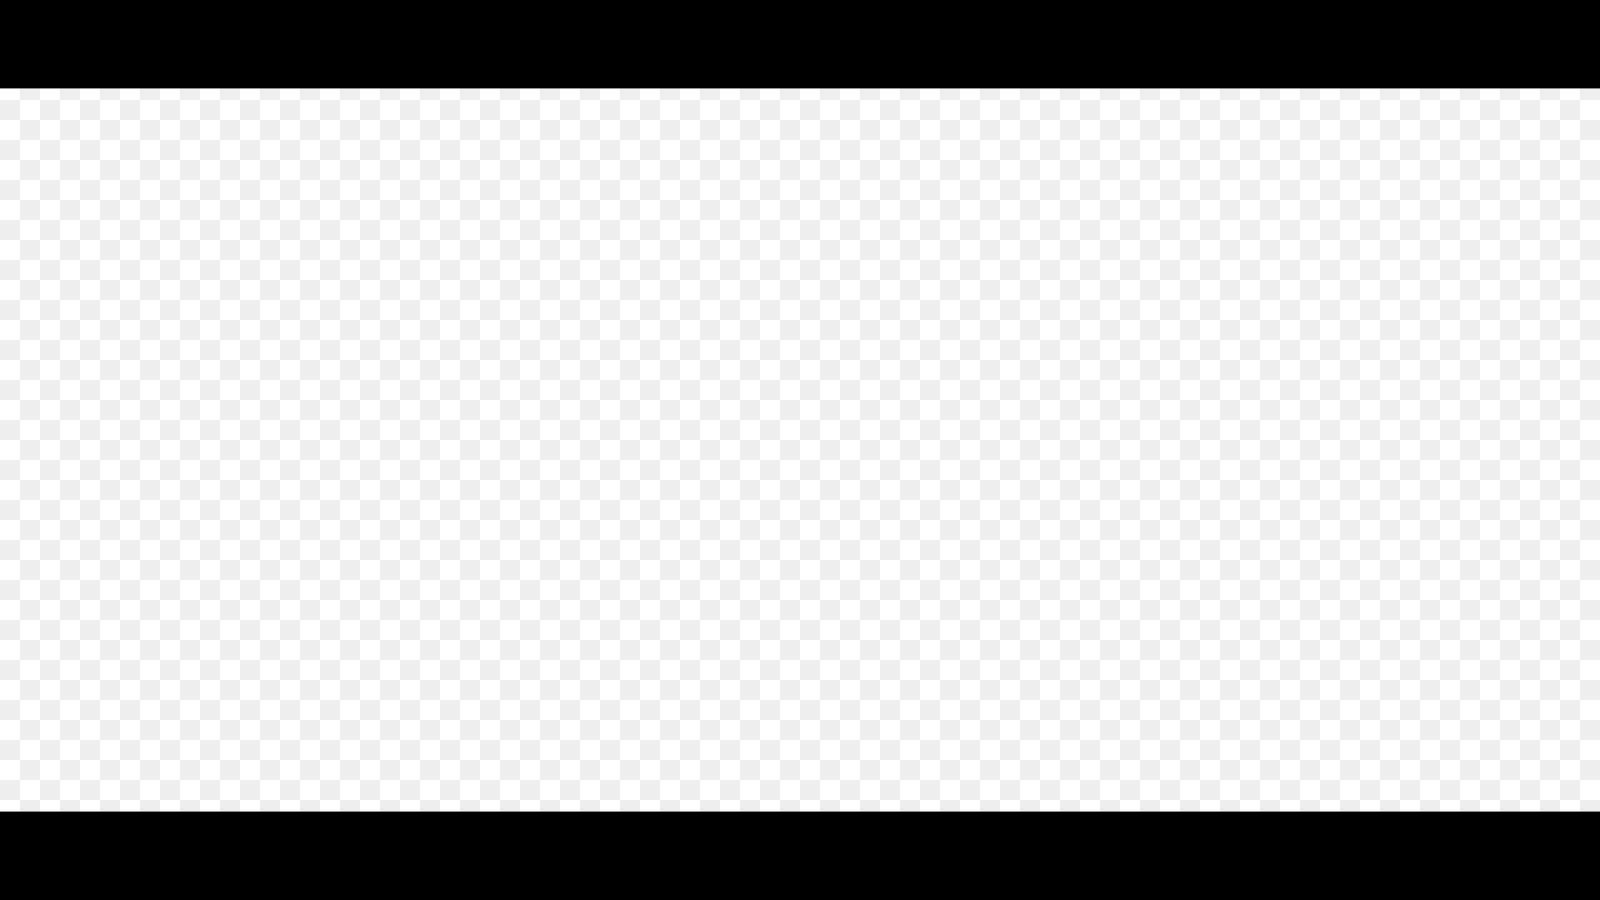 Unduh Cinema Bar Png Gratis Wallpaper White Cinematic Bars Png 10 Free Cliparts Download Cinema Bar Png Download Ci In 2021 Gratis Hd Wallpaper Wallpaper